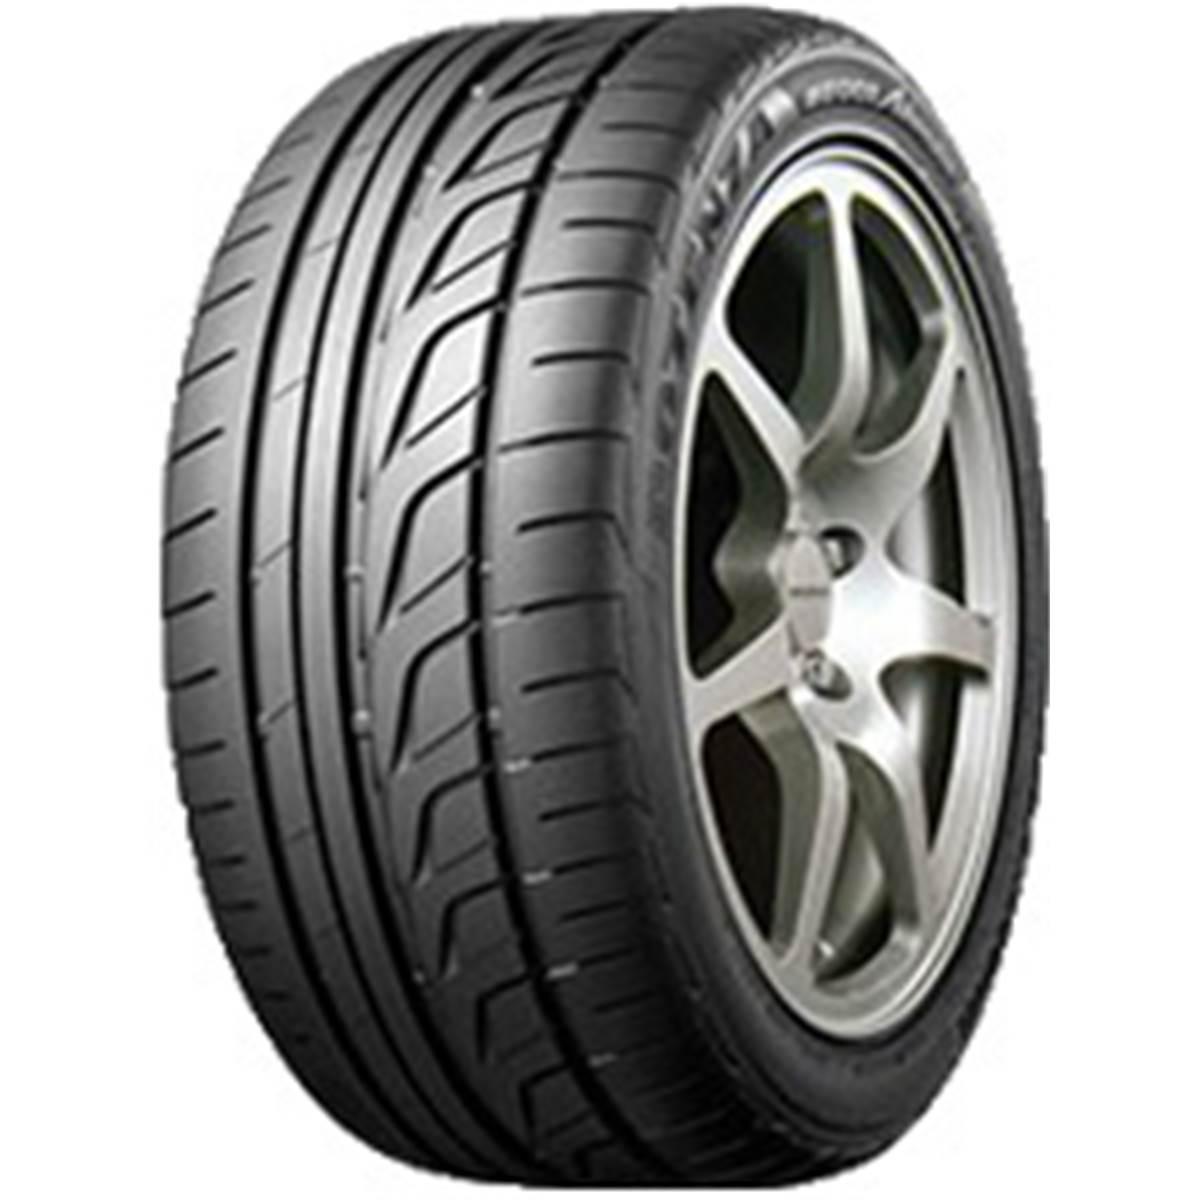 Pneu Bridgestone 215/55R16 93W POTENZA ADRENALIN RE002